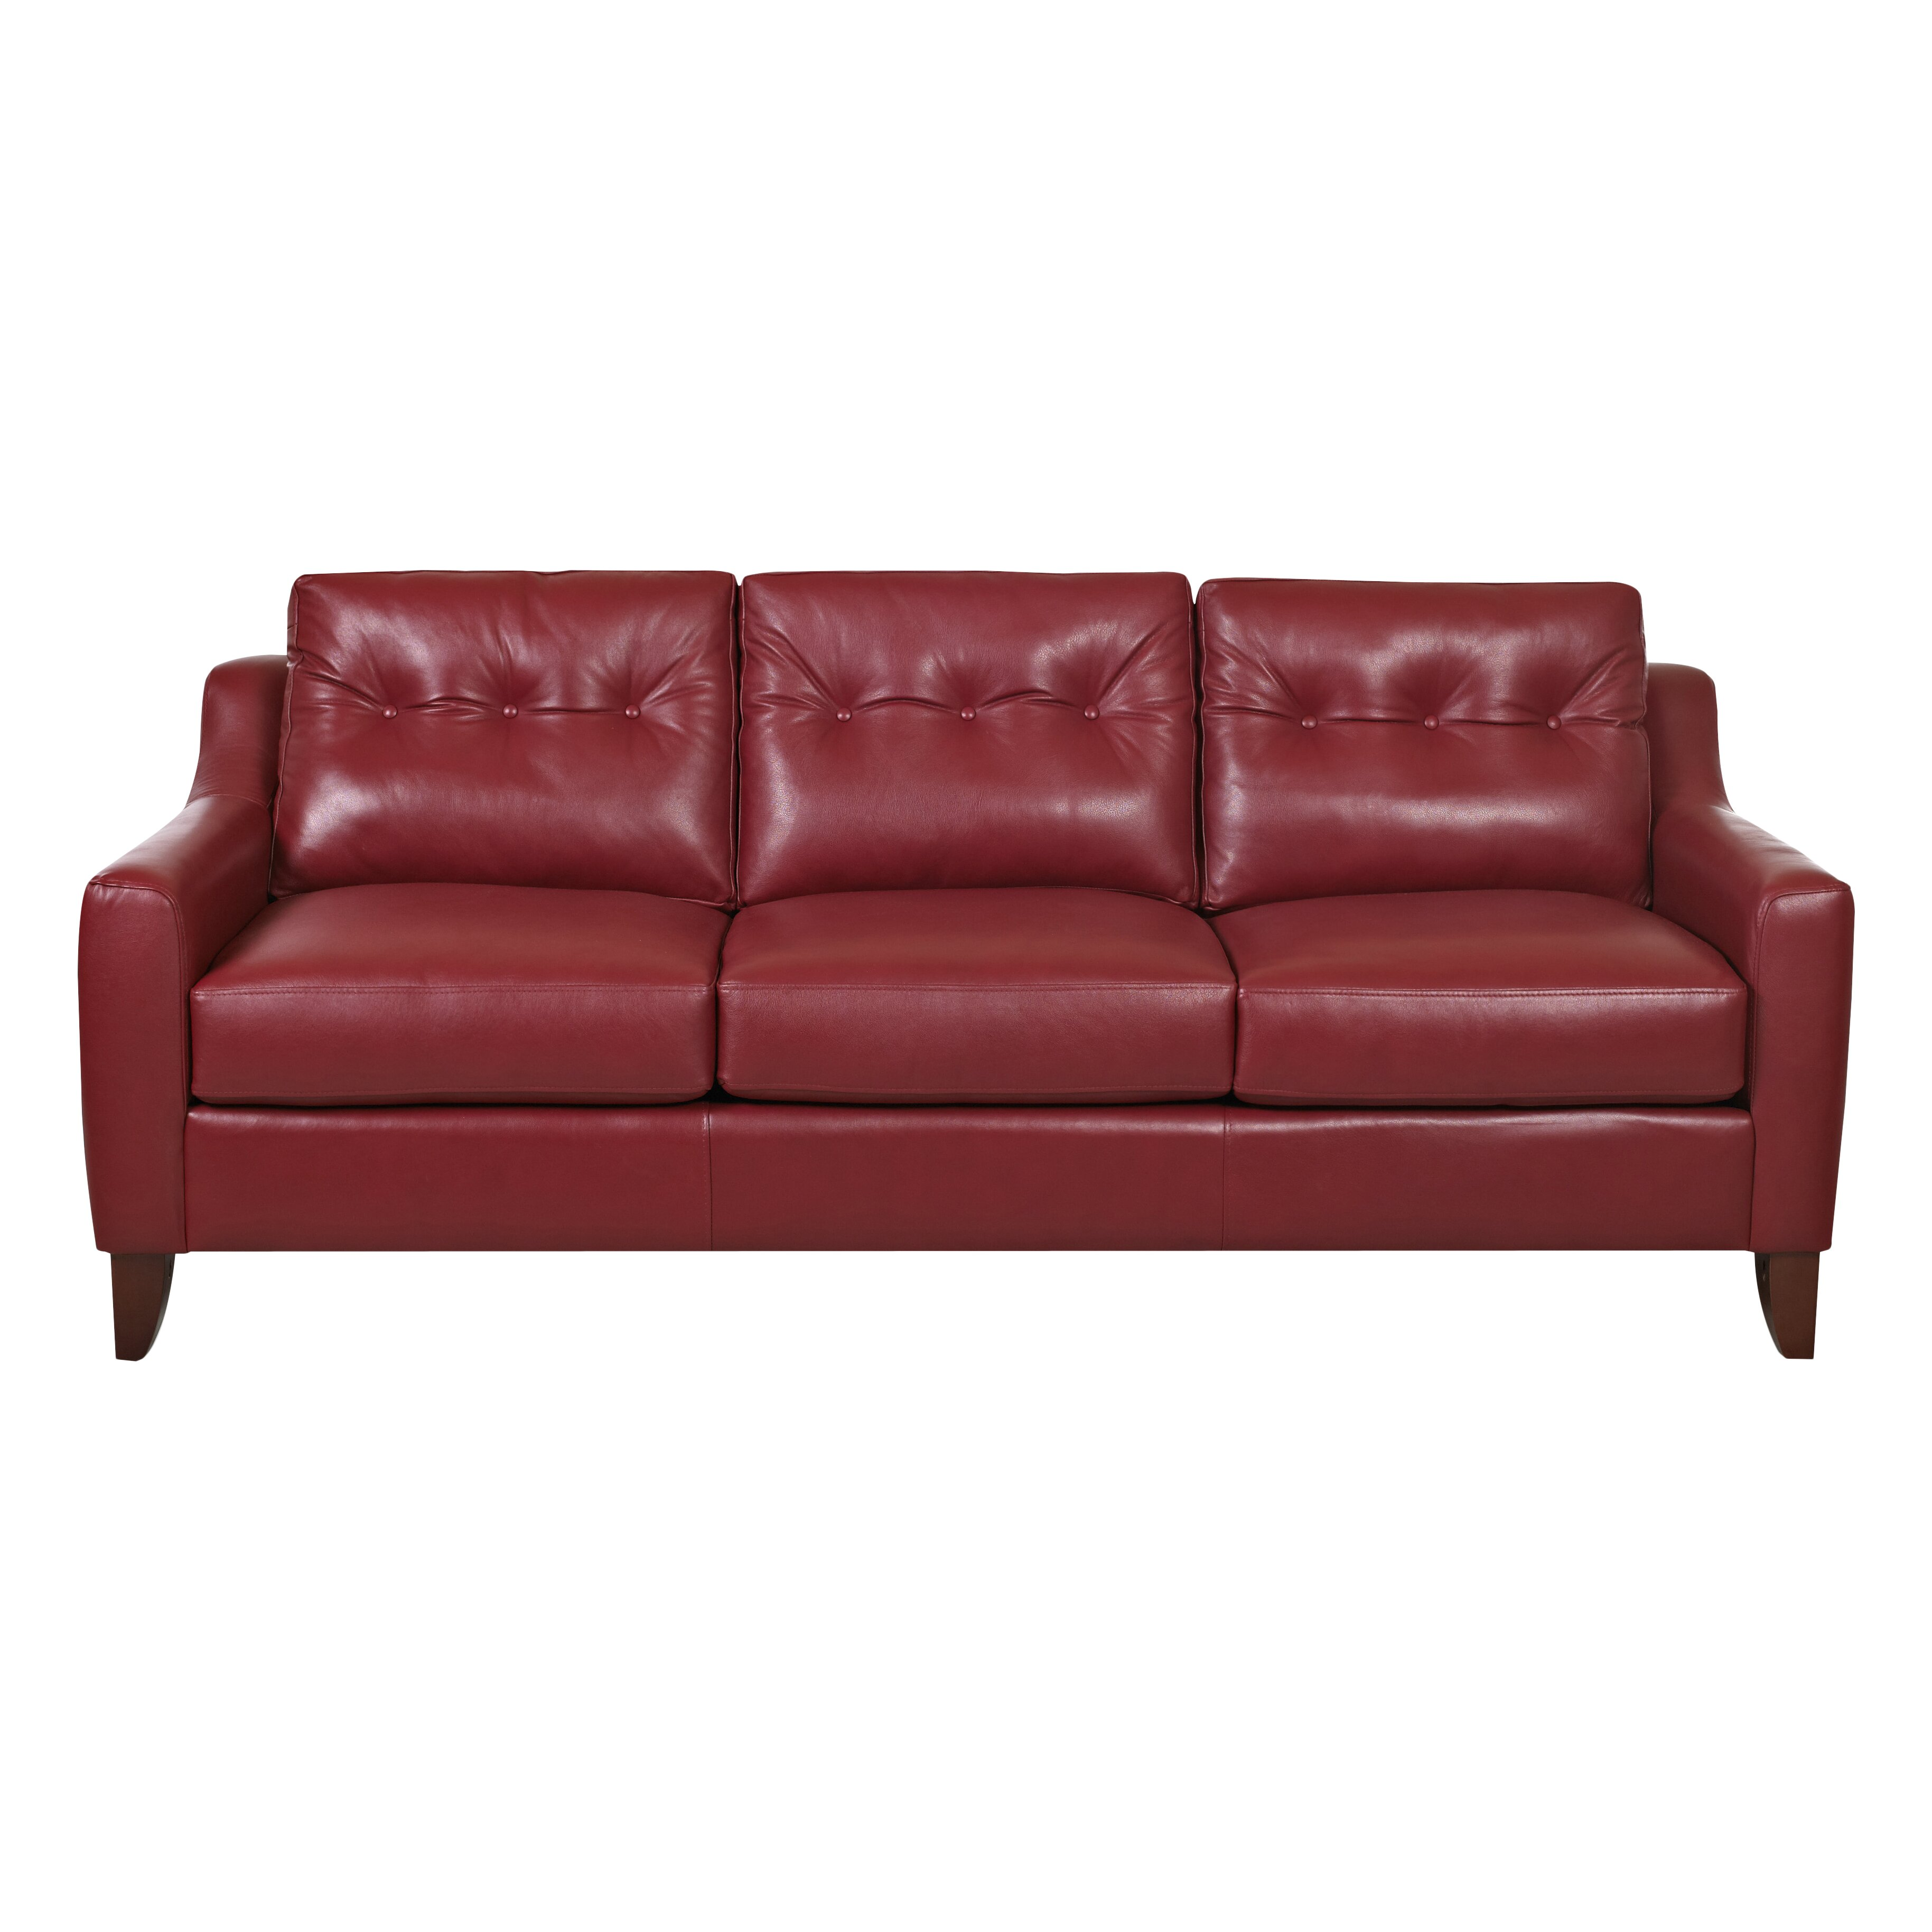 Wade Logan Lyle Leather Sofa Reviews Wayfair